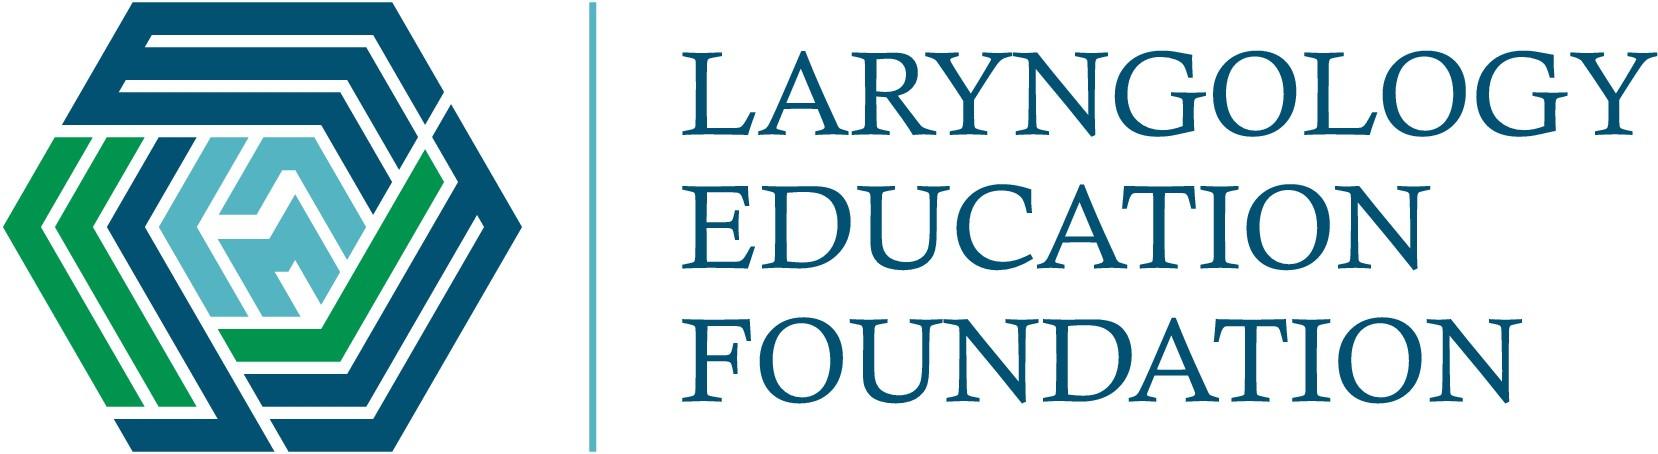 Create a winning logo for the Laryngology Education Foundation